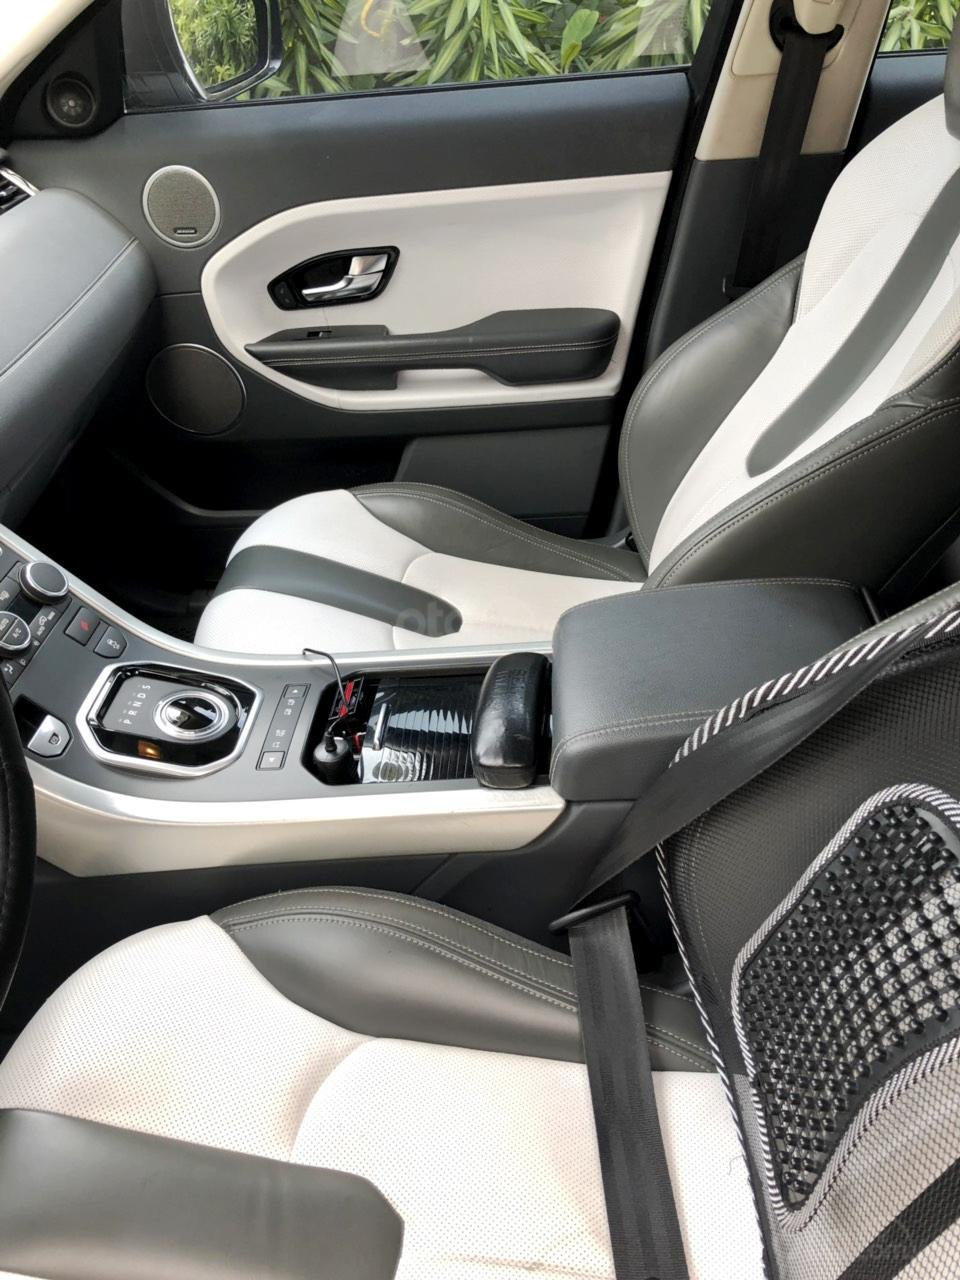 Range Rover Evoque Dynamic 2.0L SX 2012, đi 52000km, xe chính chủ-8